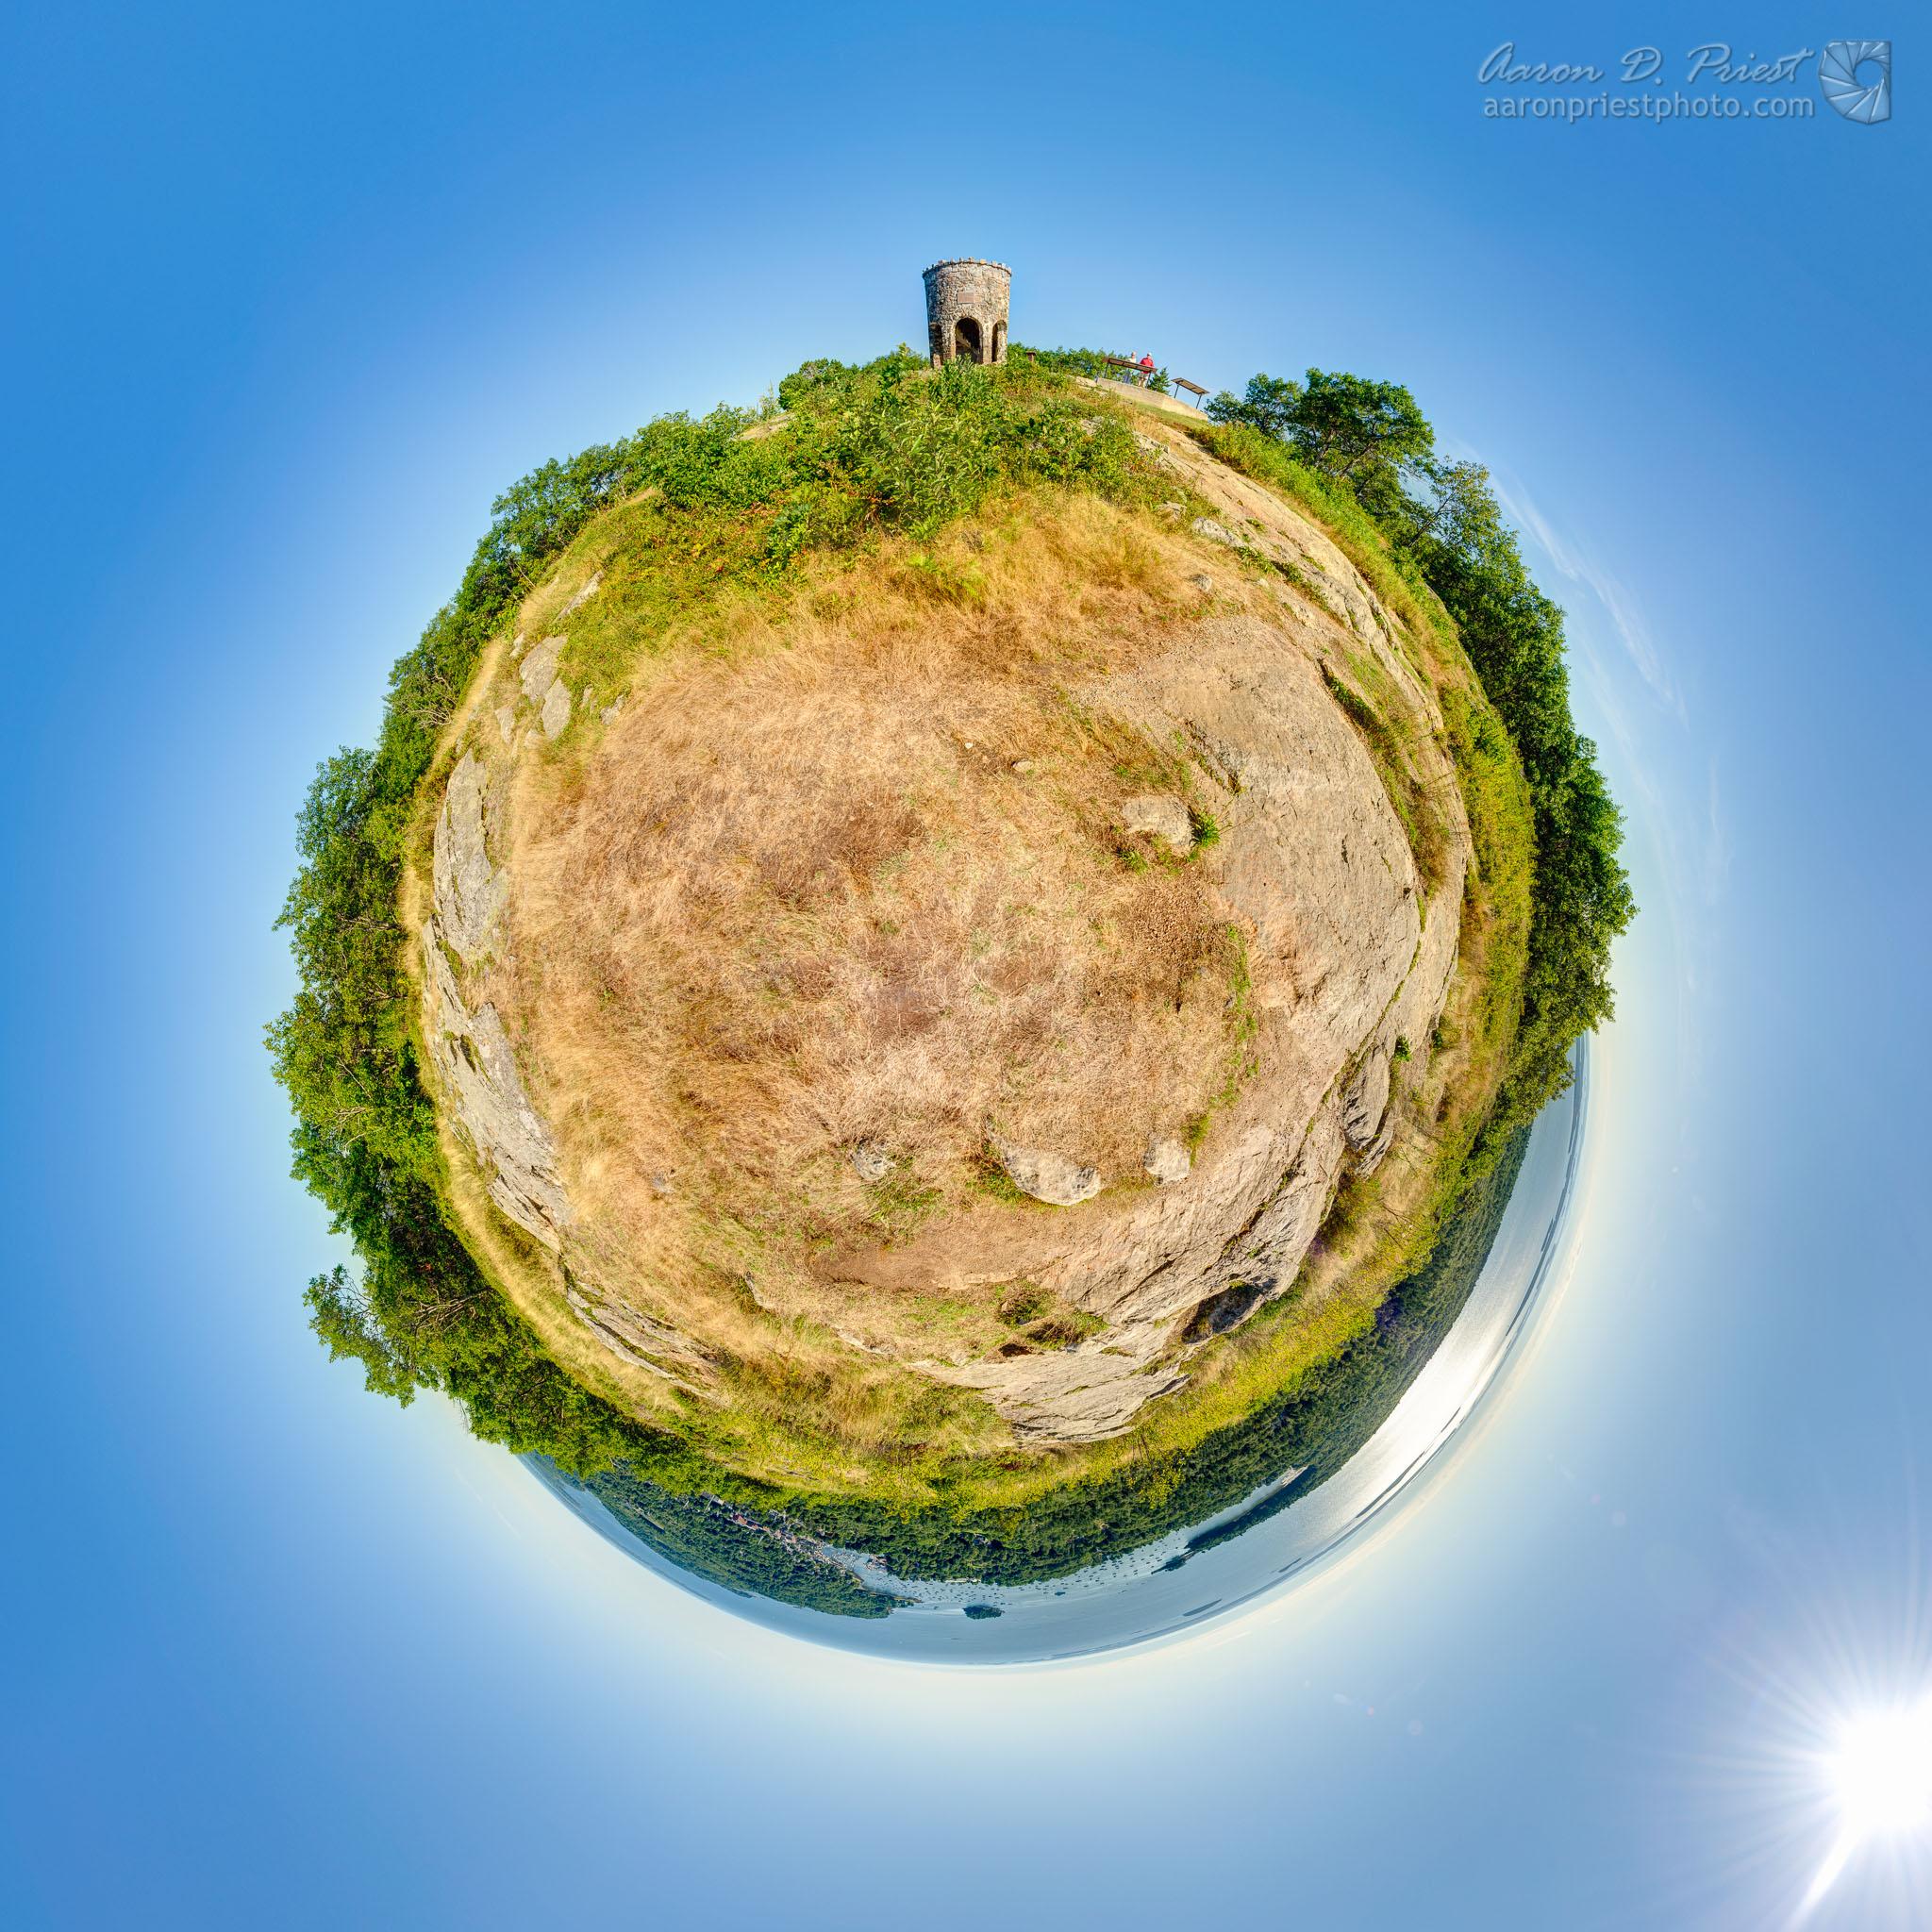 2012-08-19-89065 Little Planet.jpg